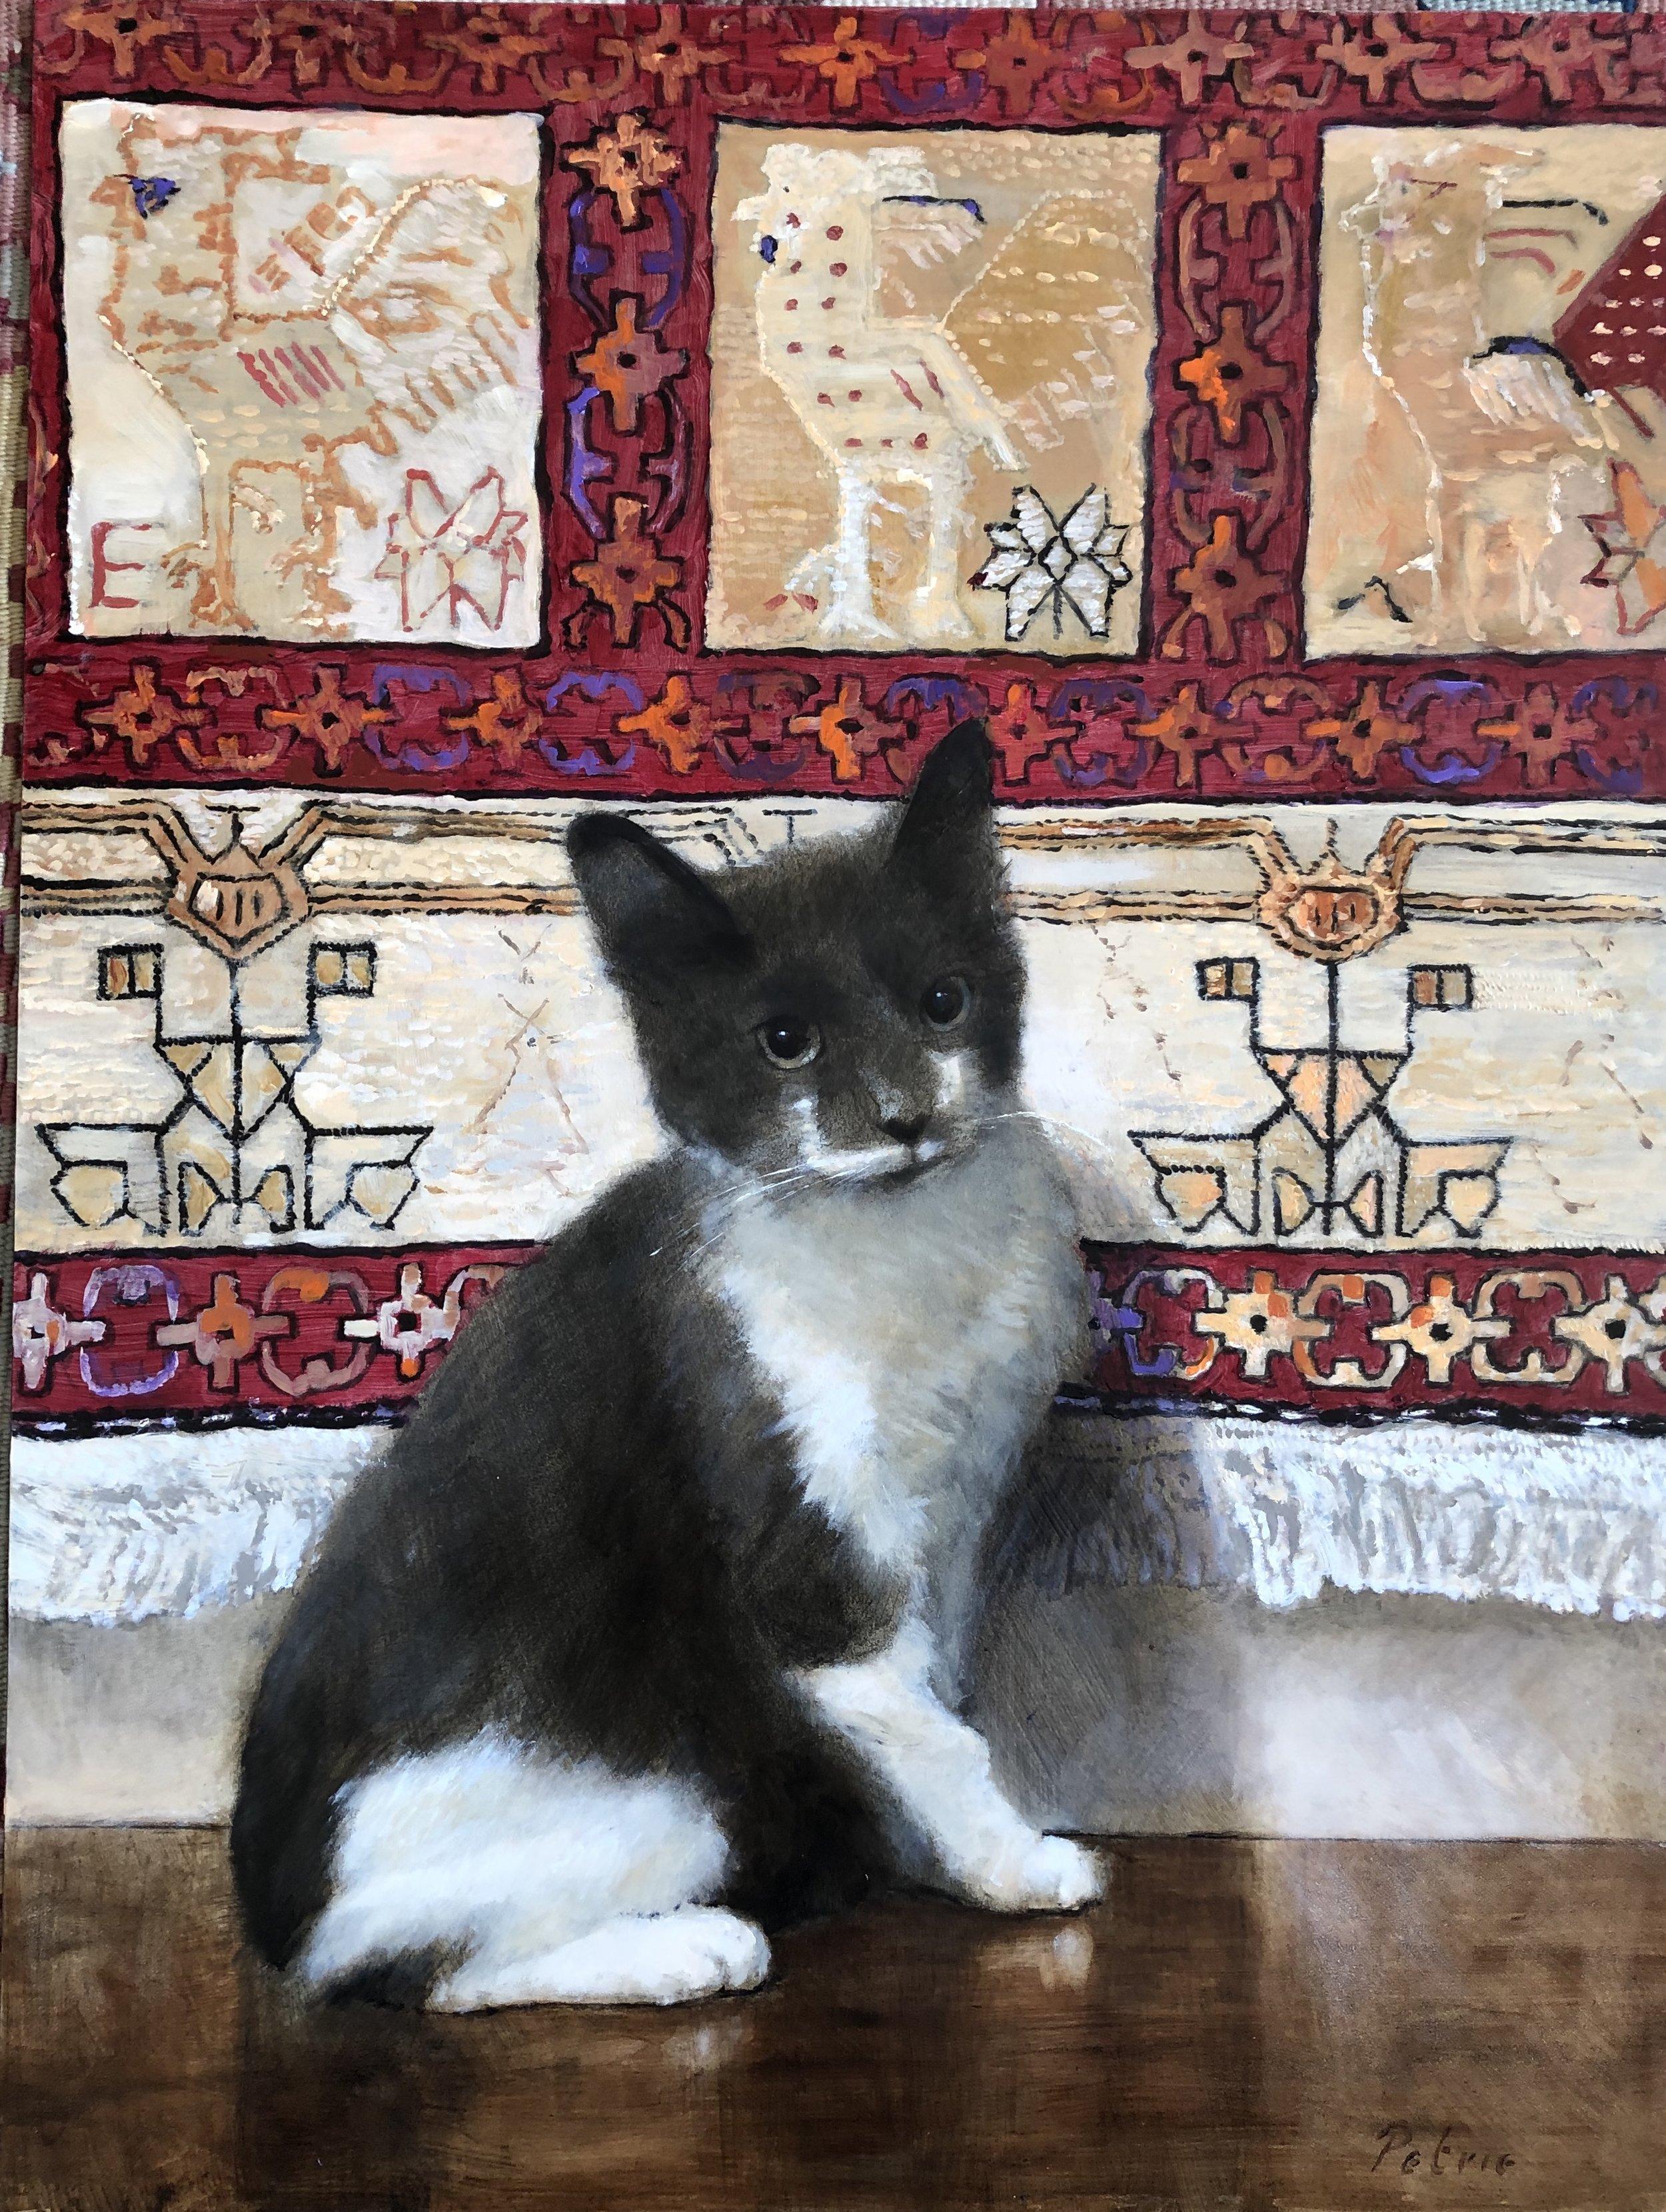 Curatorial Cats